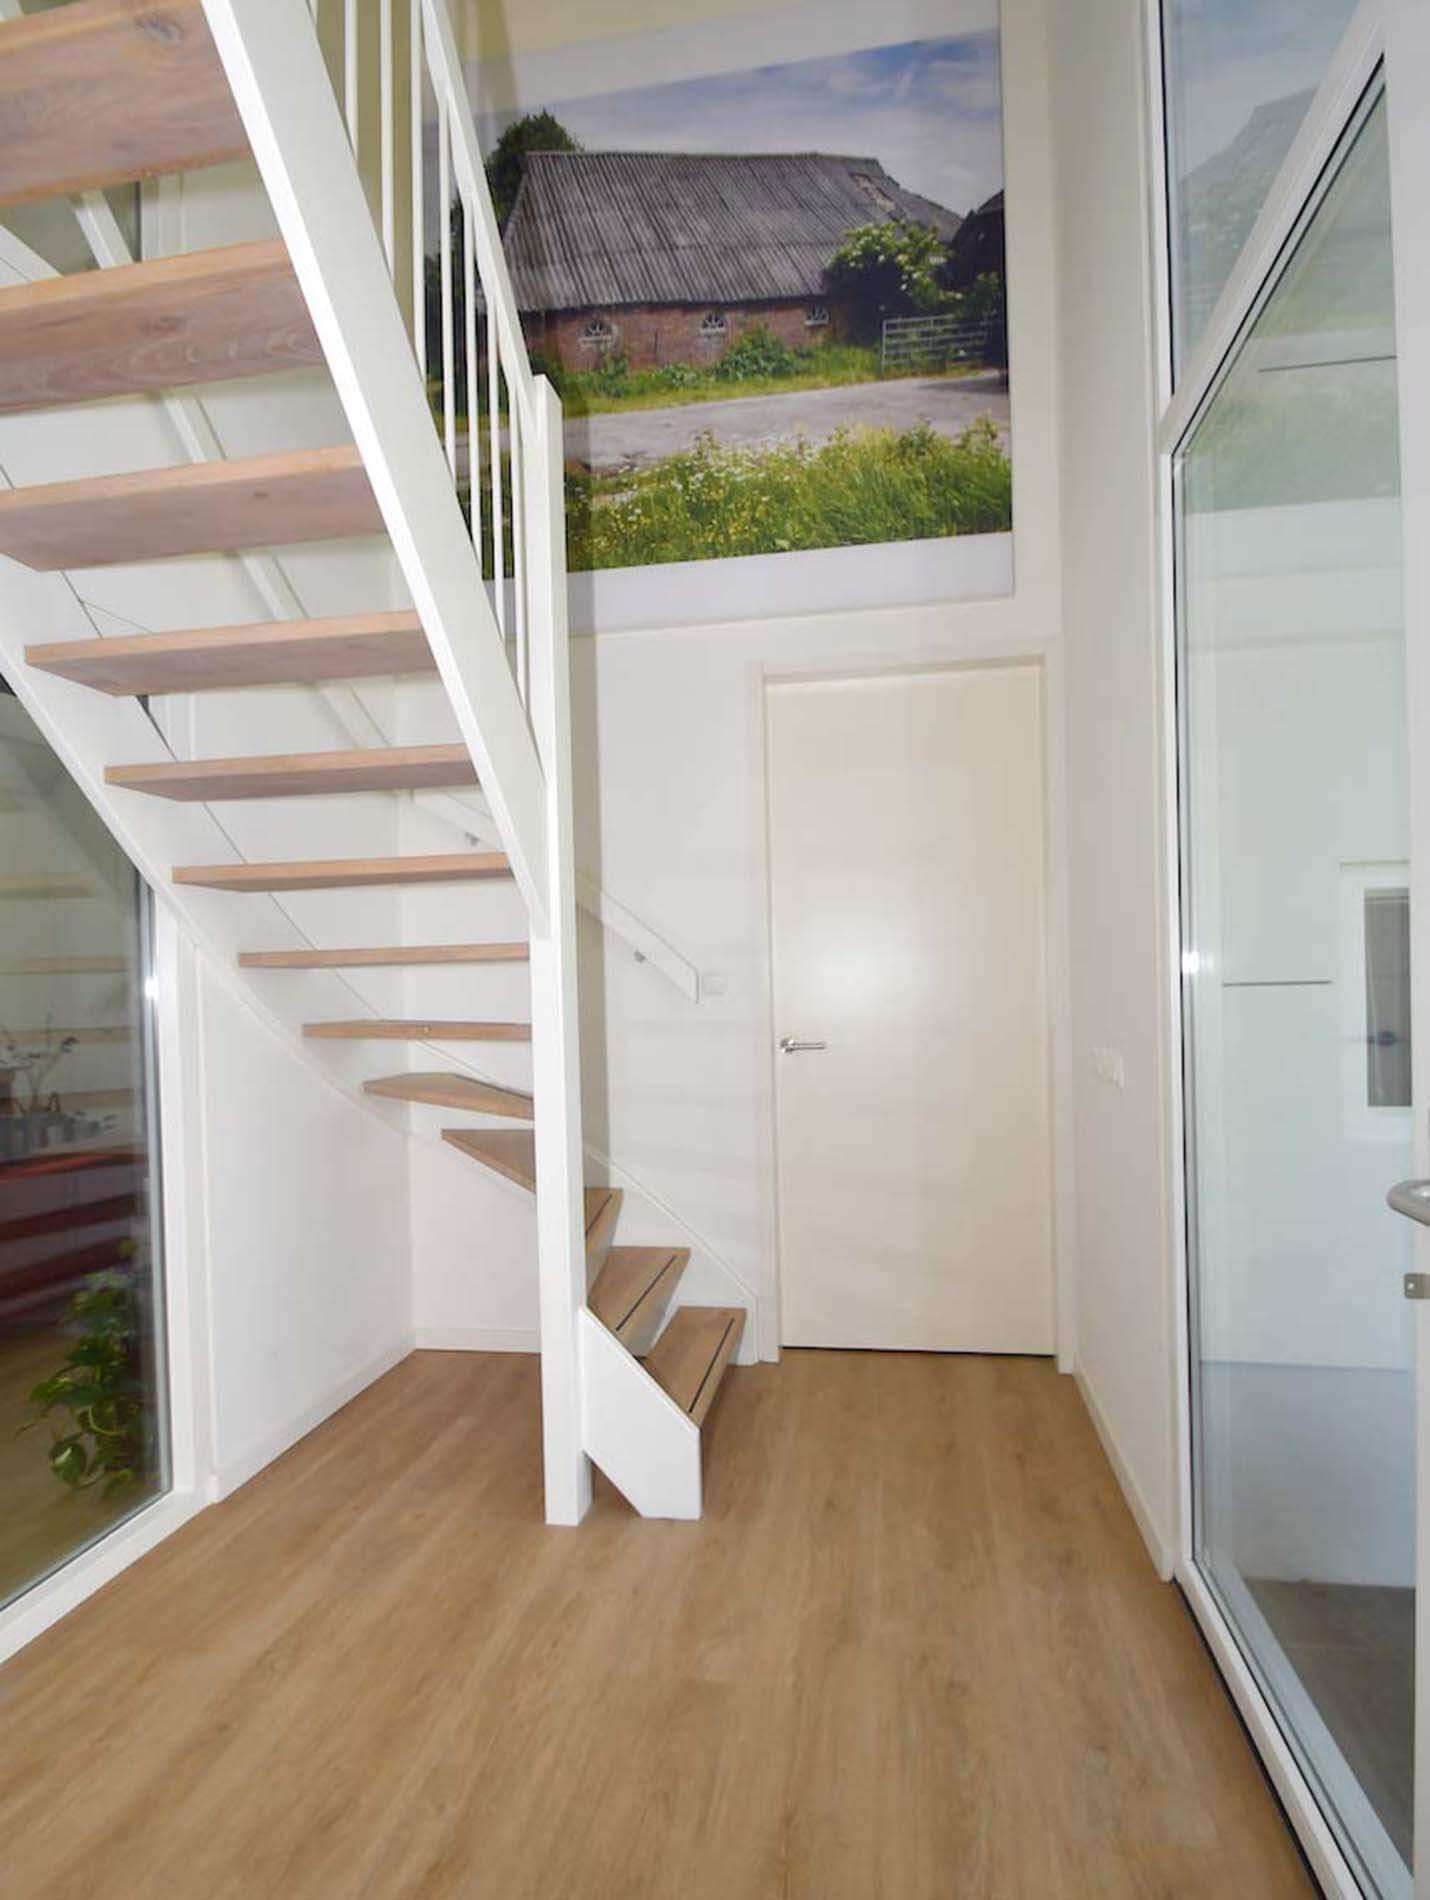 3. interieur-Wijnjewouden-particuliere-woning-1900x1430p.jpg